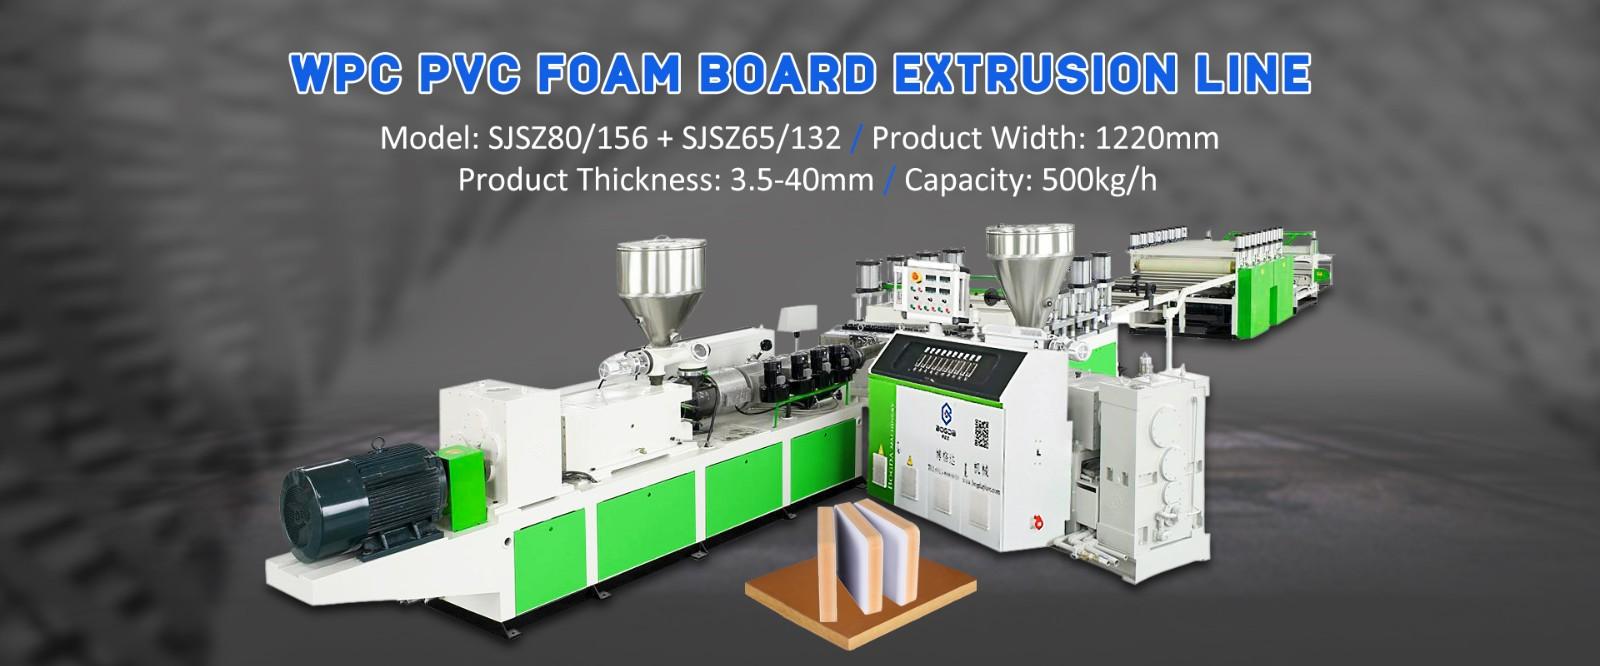 WPC PVC Foam Board Extrusion Line